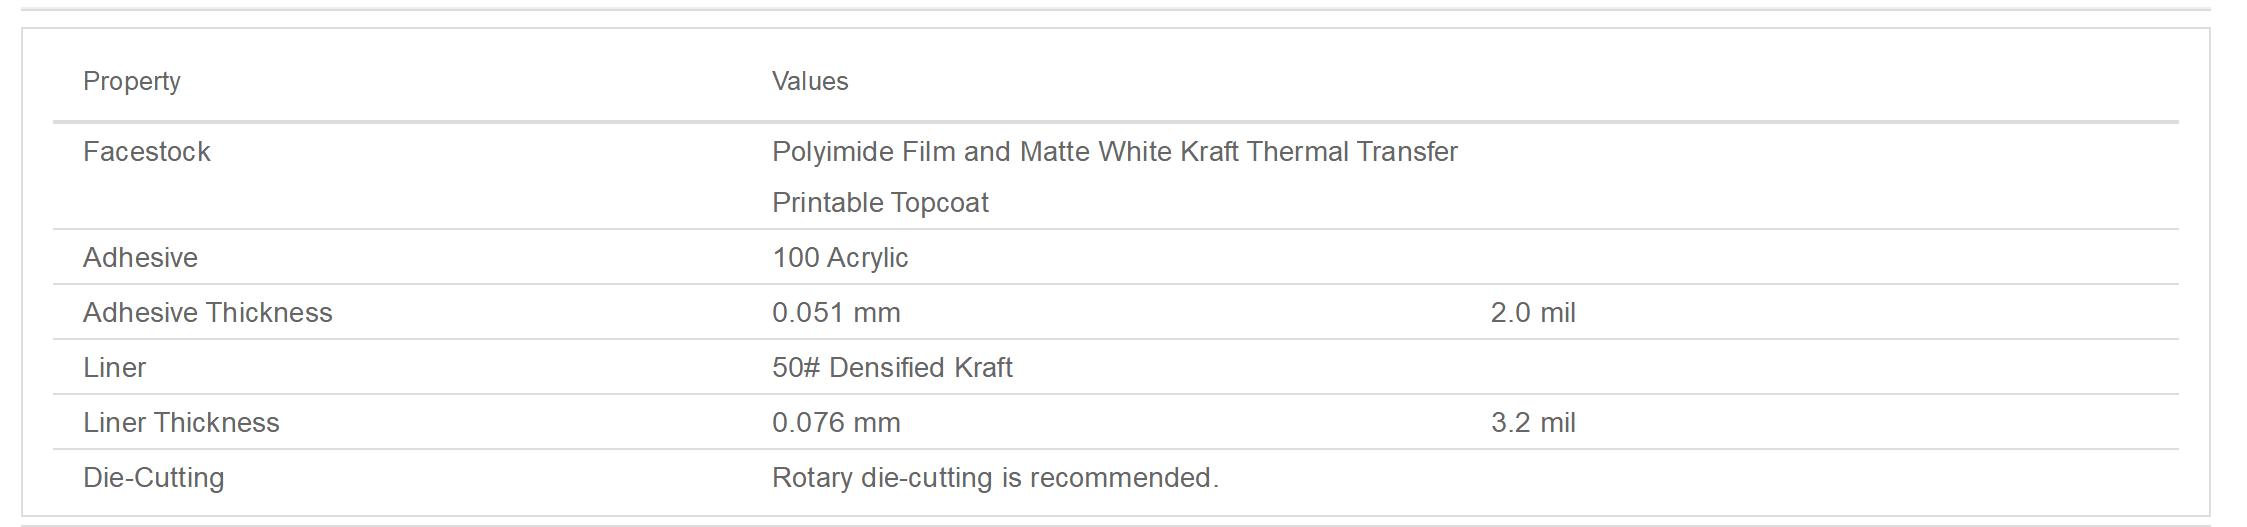 3M 7812 tape data sheet by aerchs